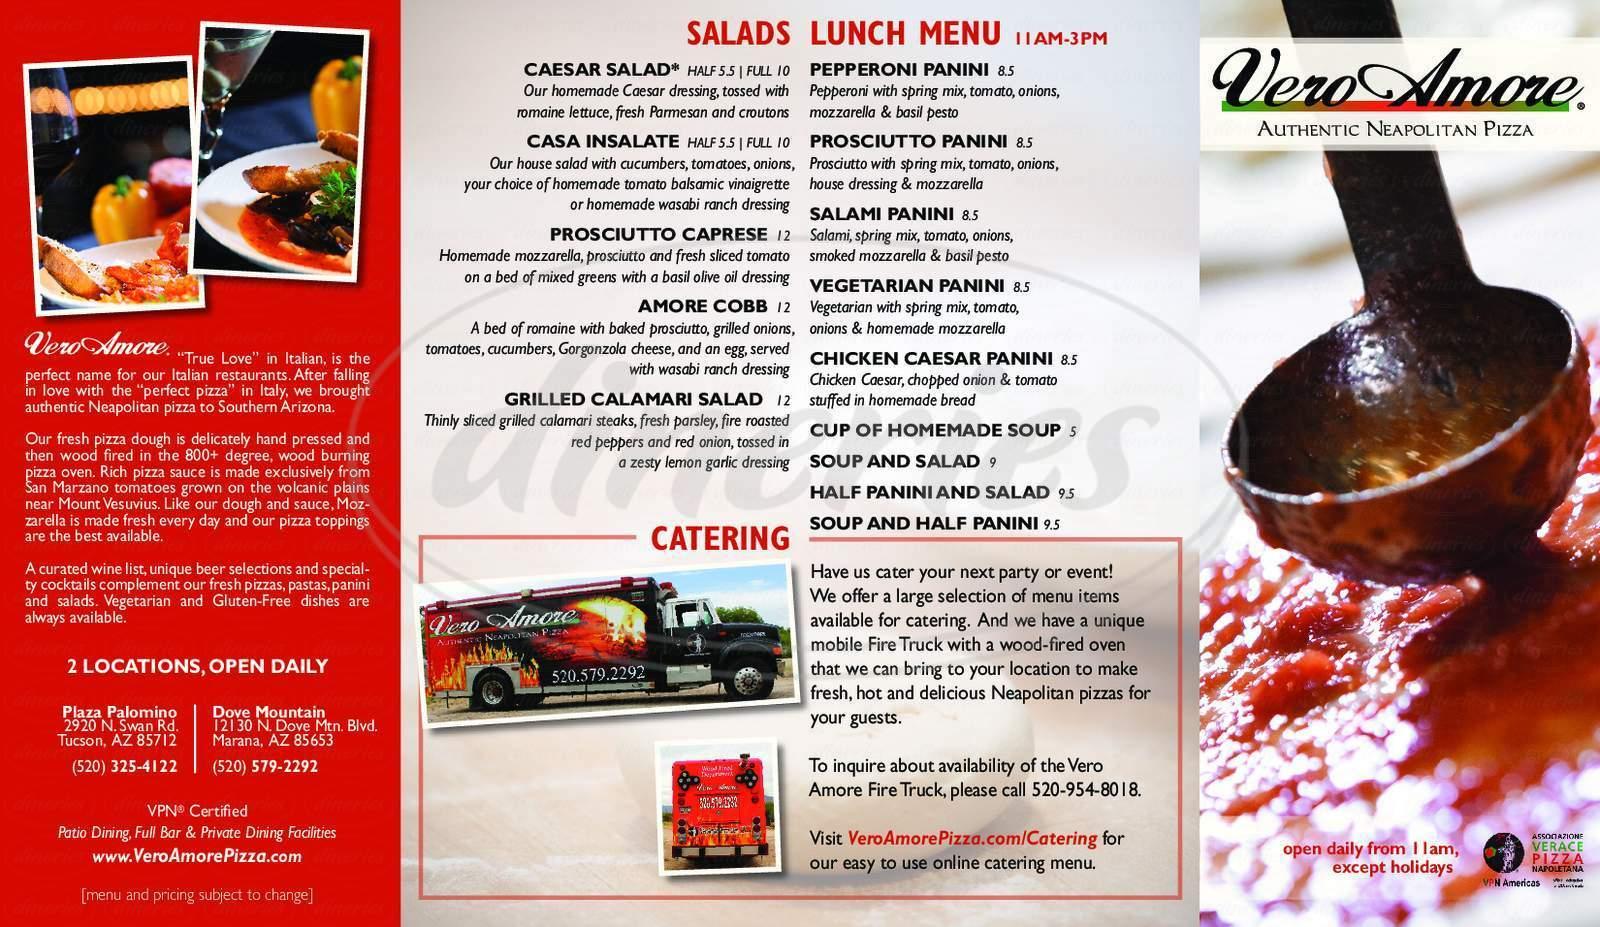 menu for Vero Amore